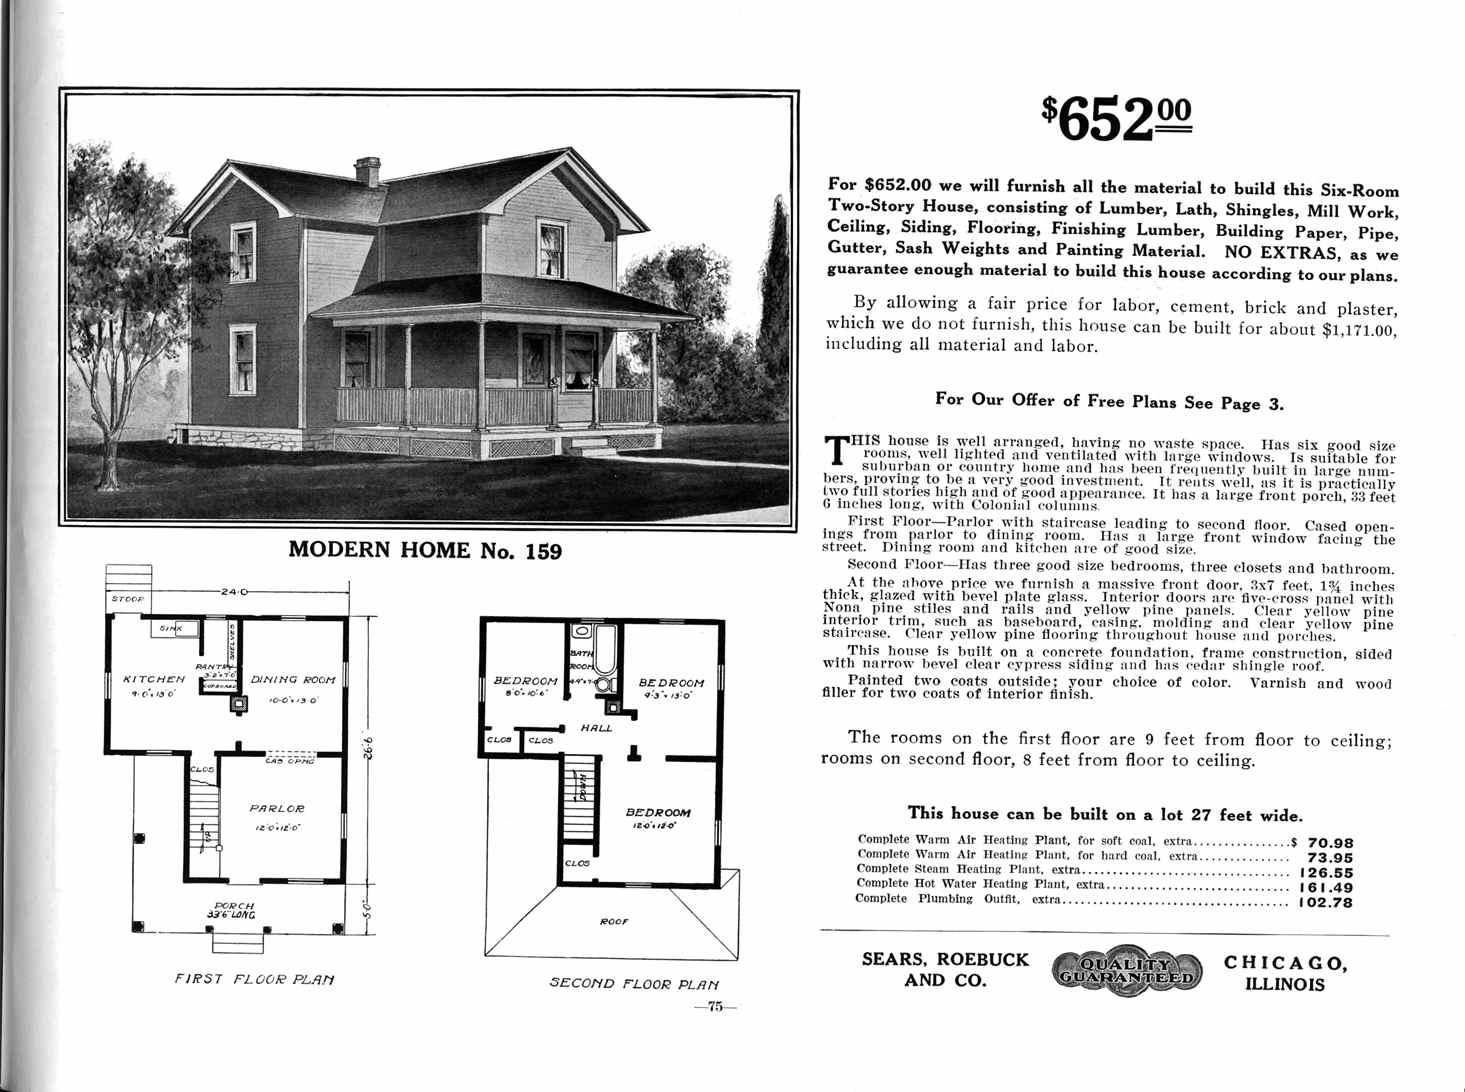 Gallery Of Sears Roebuck House Plans. FileSearsHome159jpg Wikimedia Commons